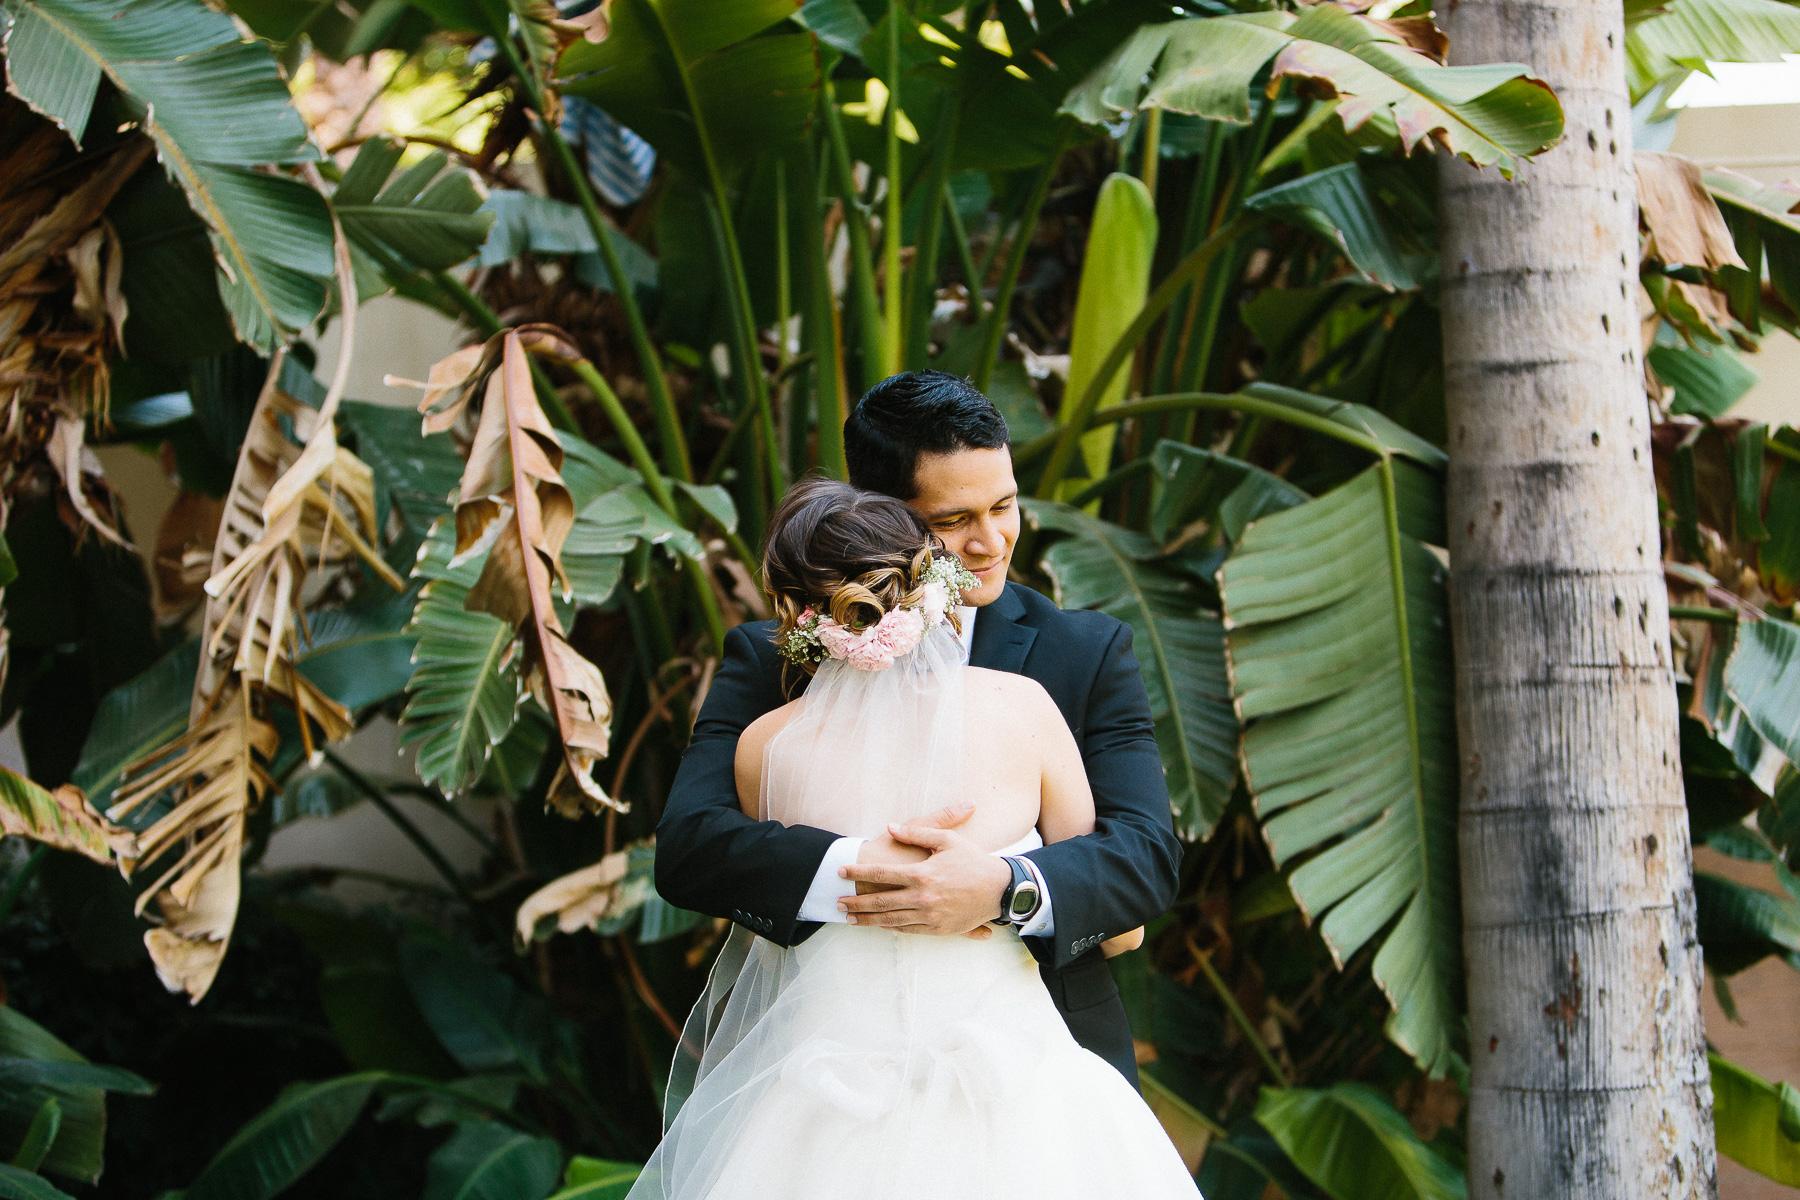 170708-Luxium-Weddings-Arizona-Sheraton-Phoenix-Arizona-Photographer-Hilton-Hawaiian-1010.jpg